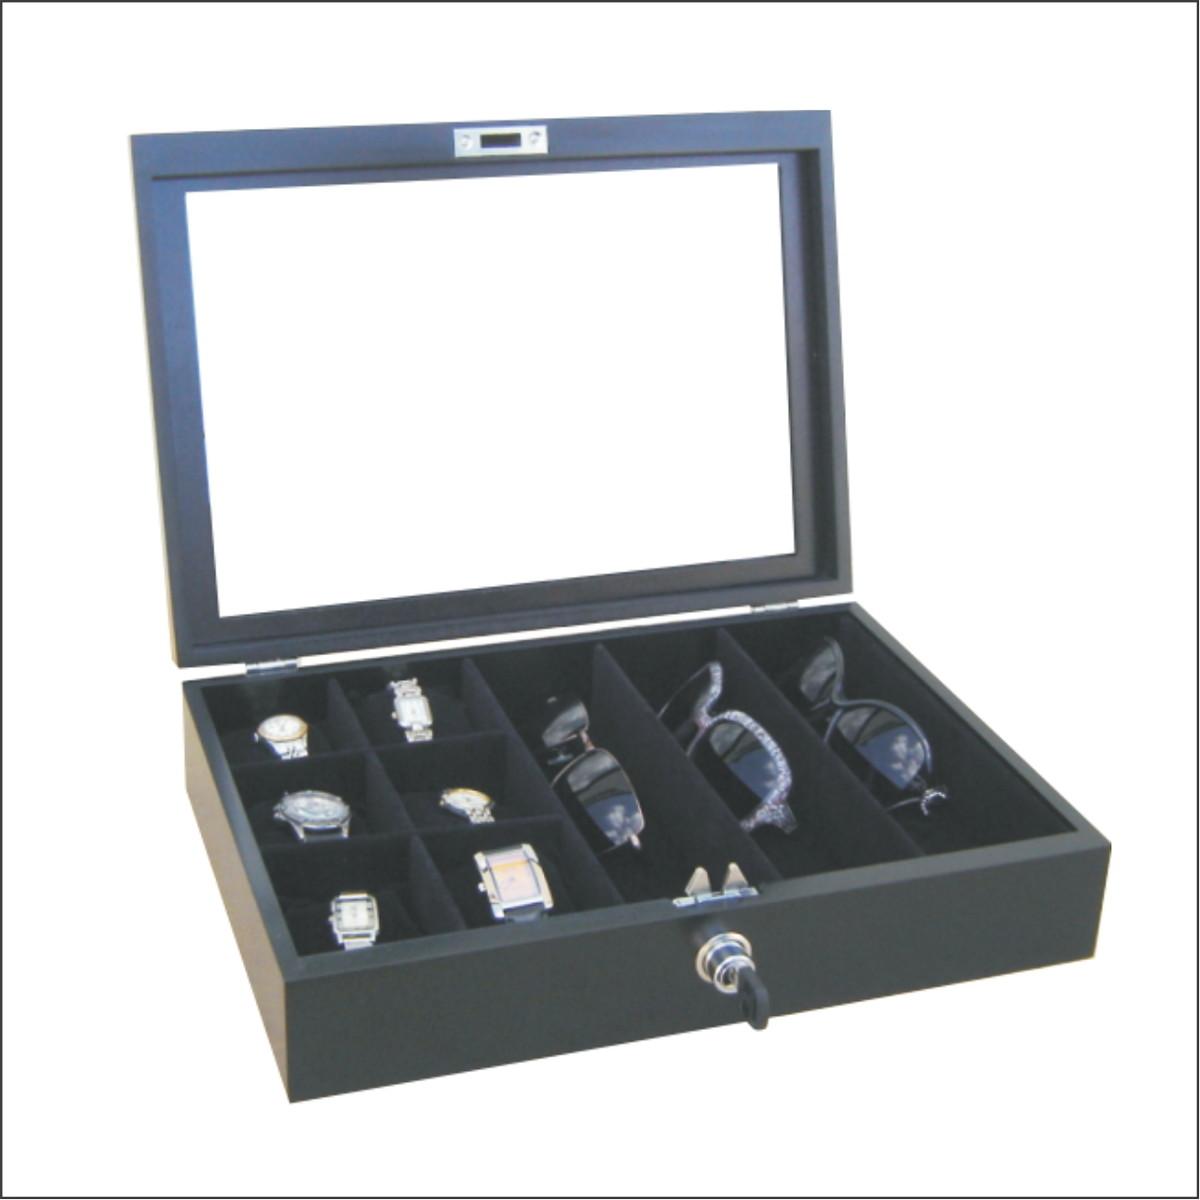 49ab3eebbe3 Caixa estojo para oculos e relógios visi no Elo7